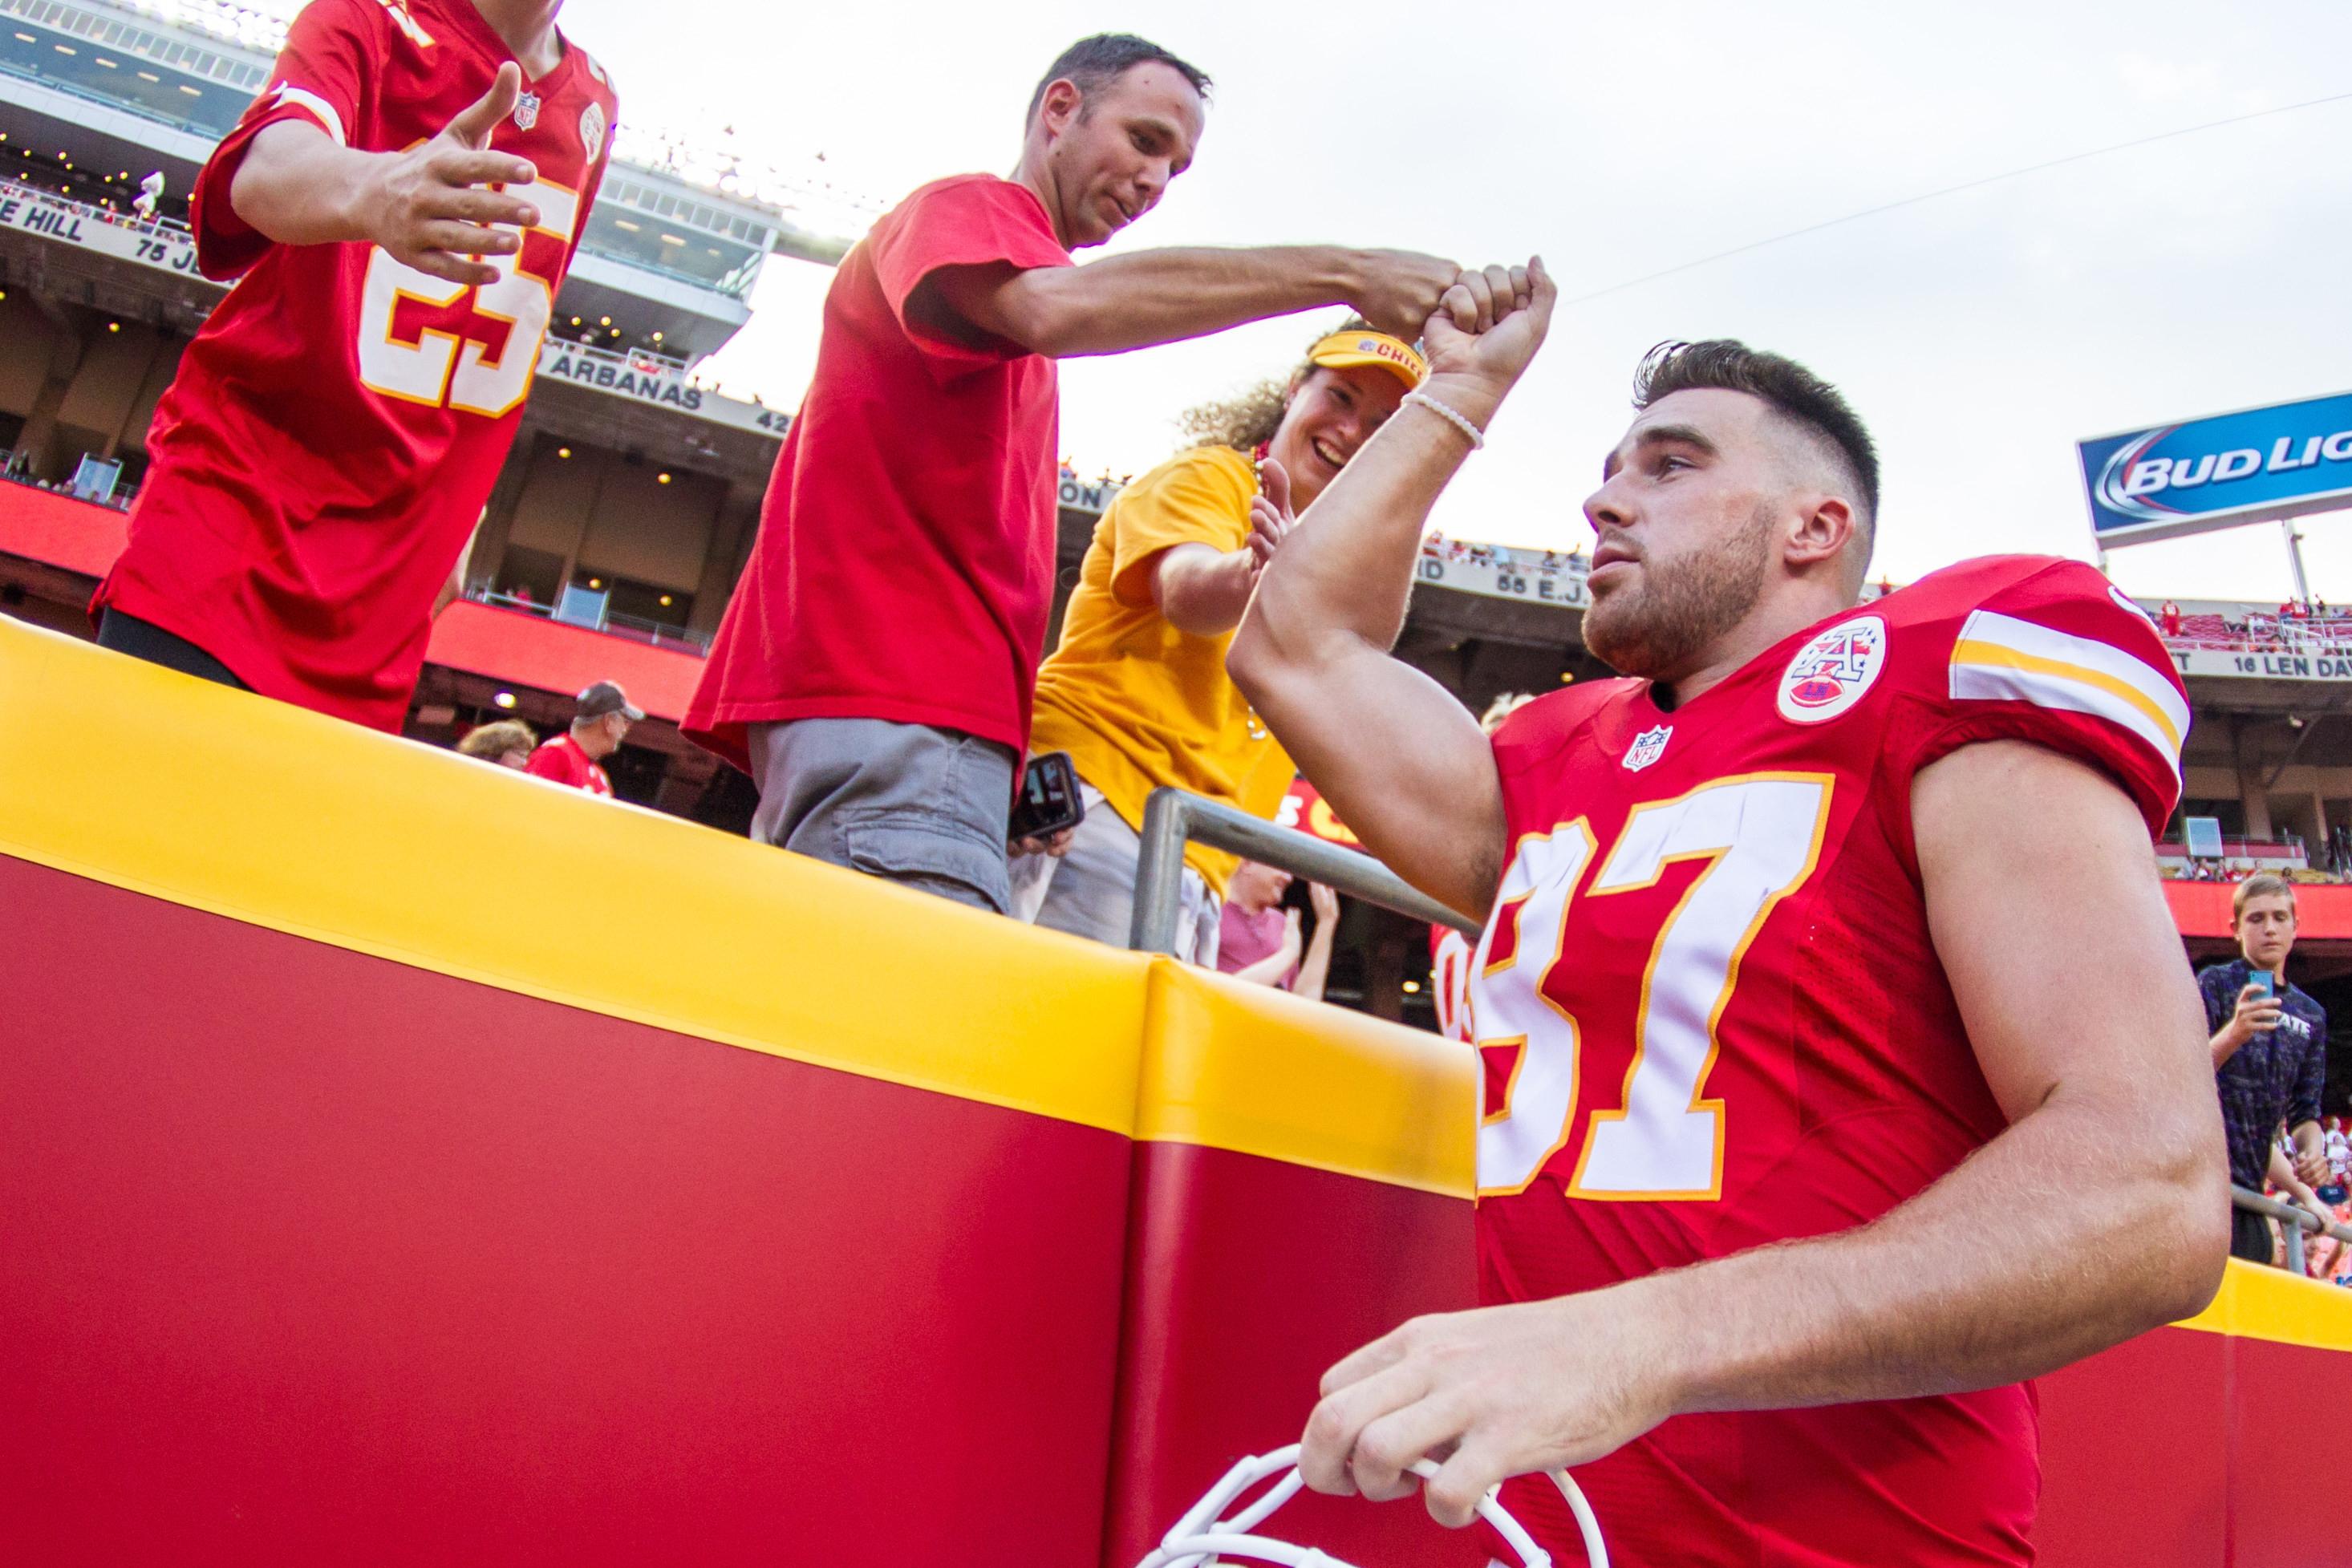 NFL: AUG 21 Preseason - Seahawks at Chiefs